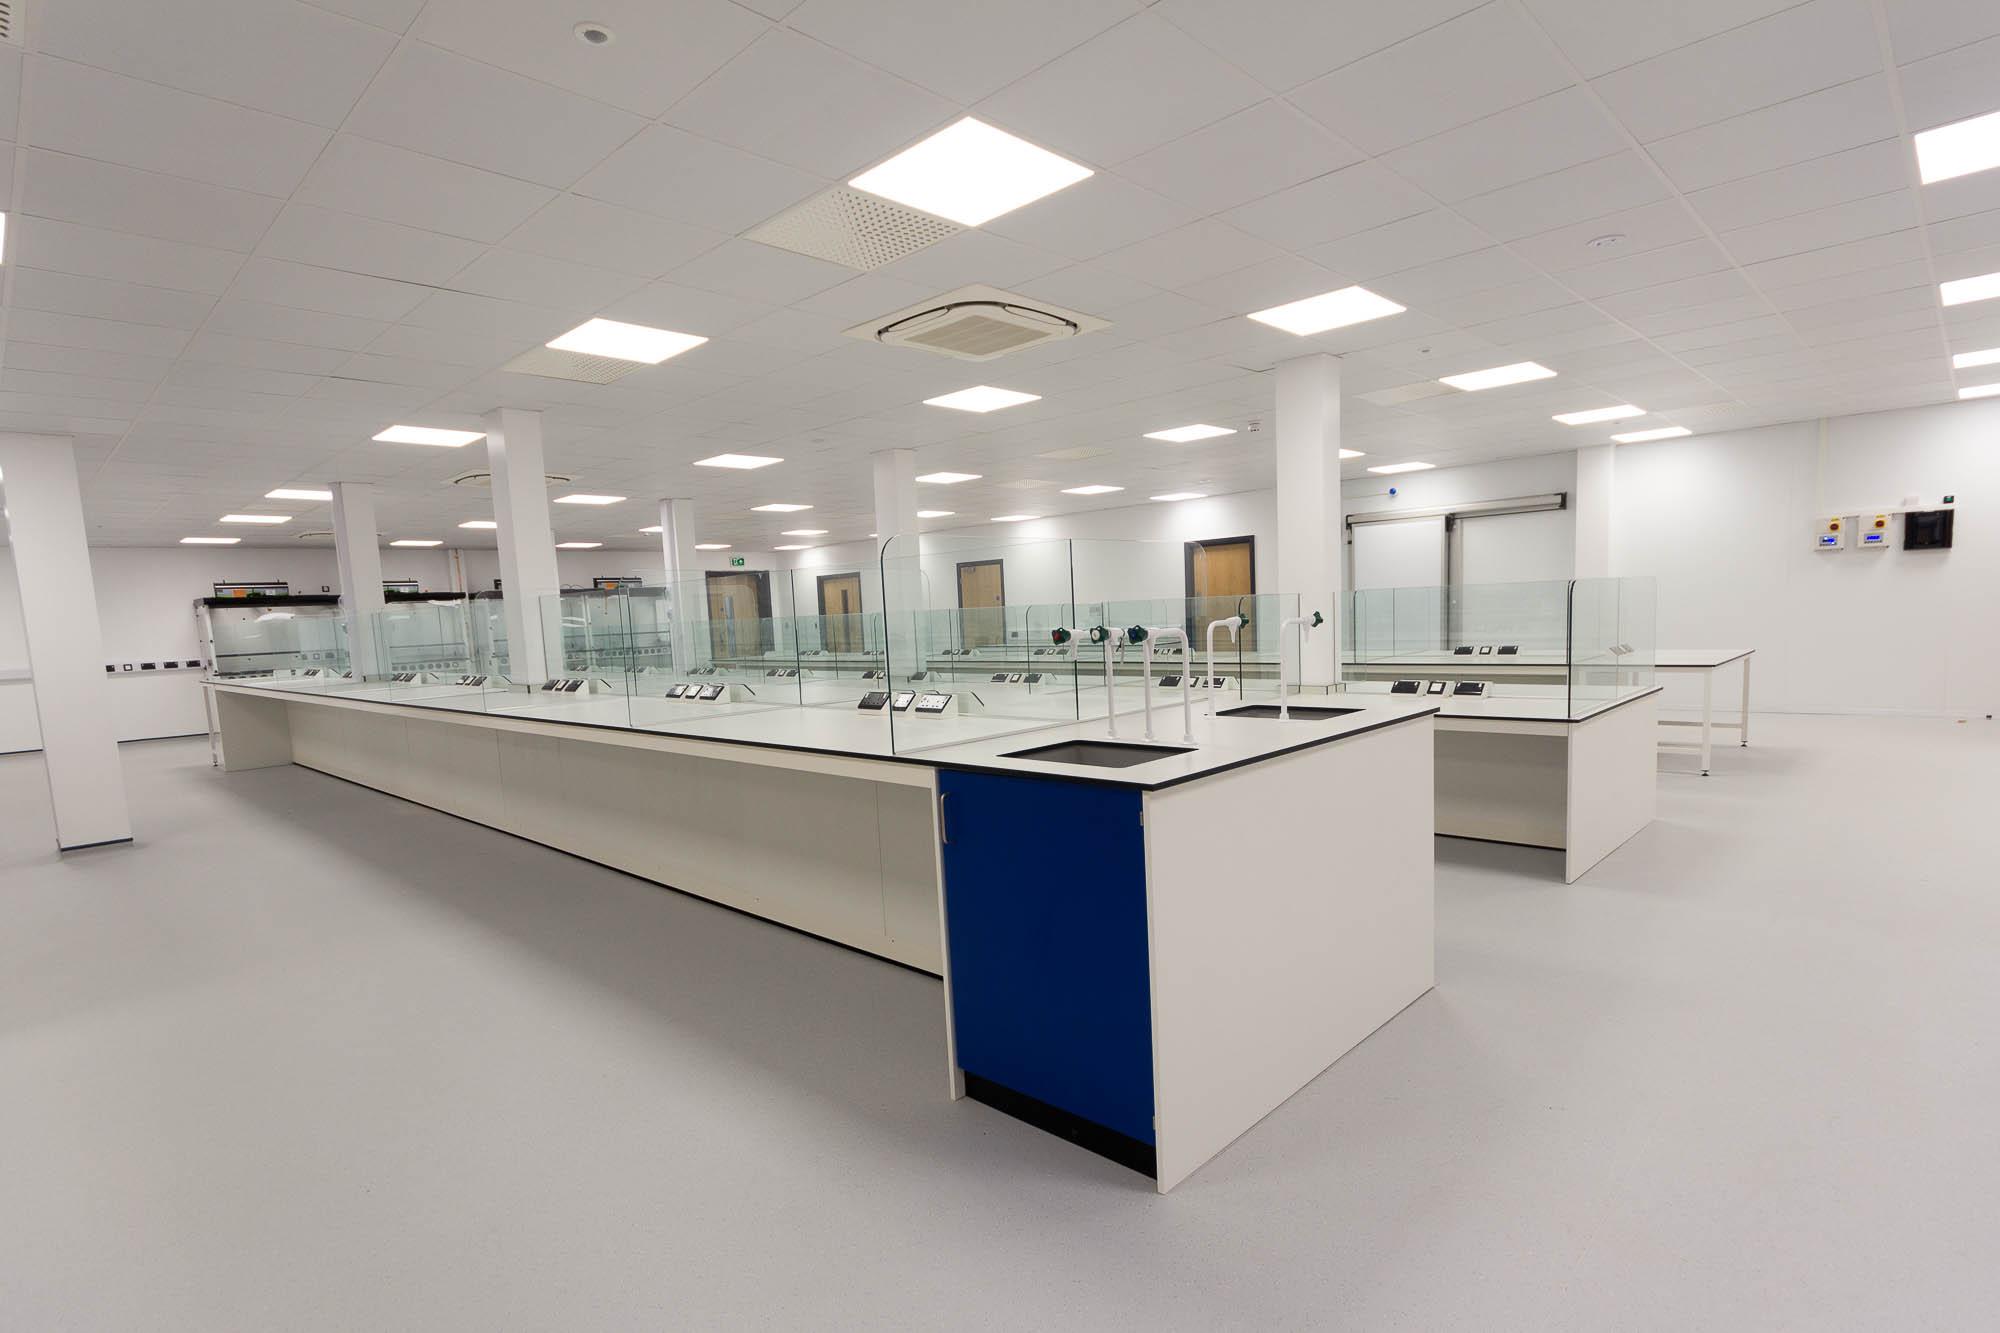 C5147 - Alere Abingdon - Unit 21 - Warehouse Laboratory Convertion Refurbishment - Lab Bench Plug Socket Door Sink Fume Cupboard